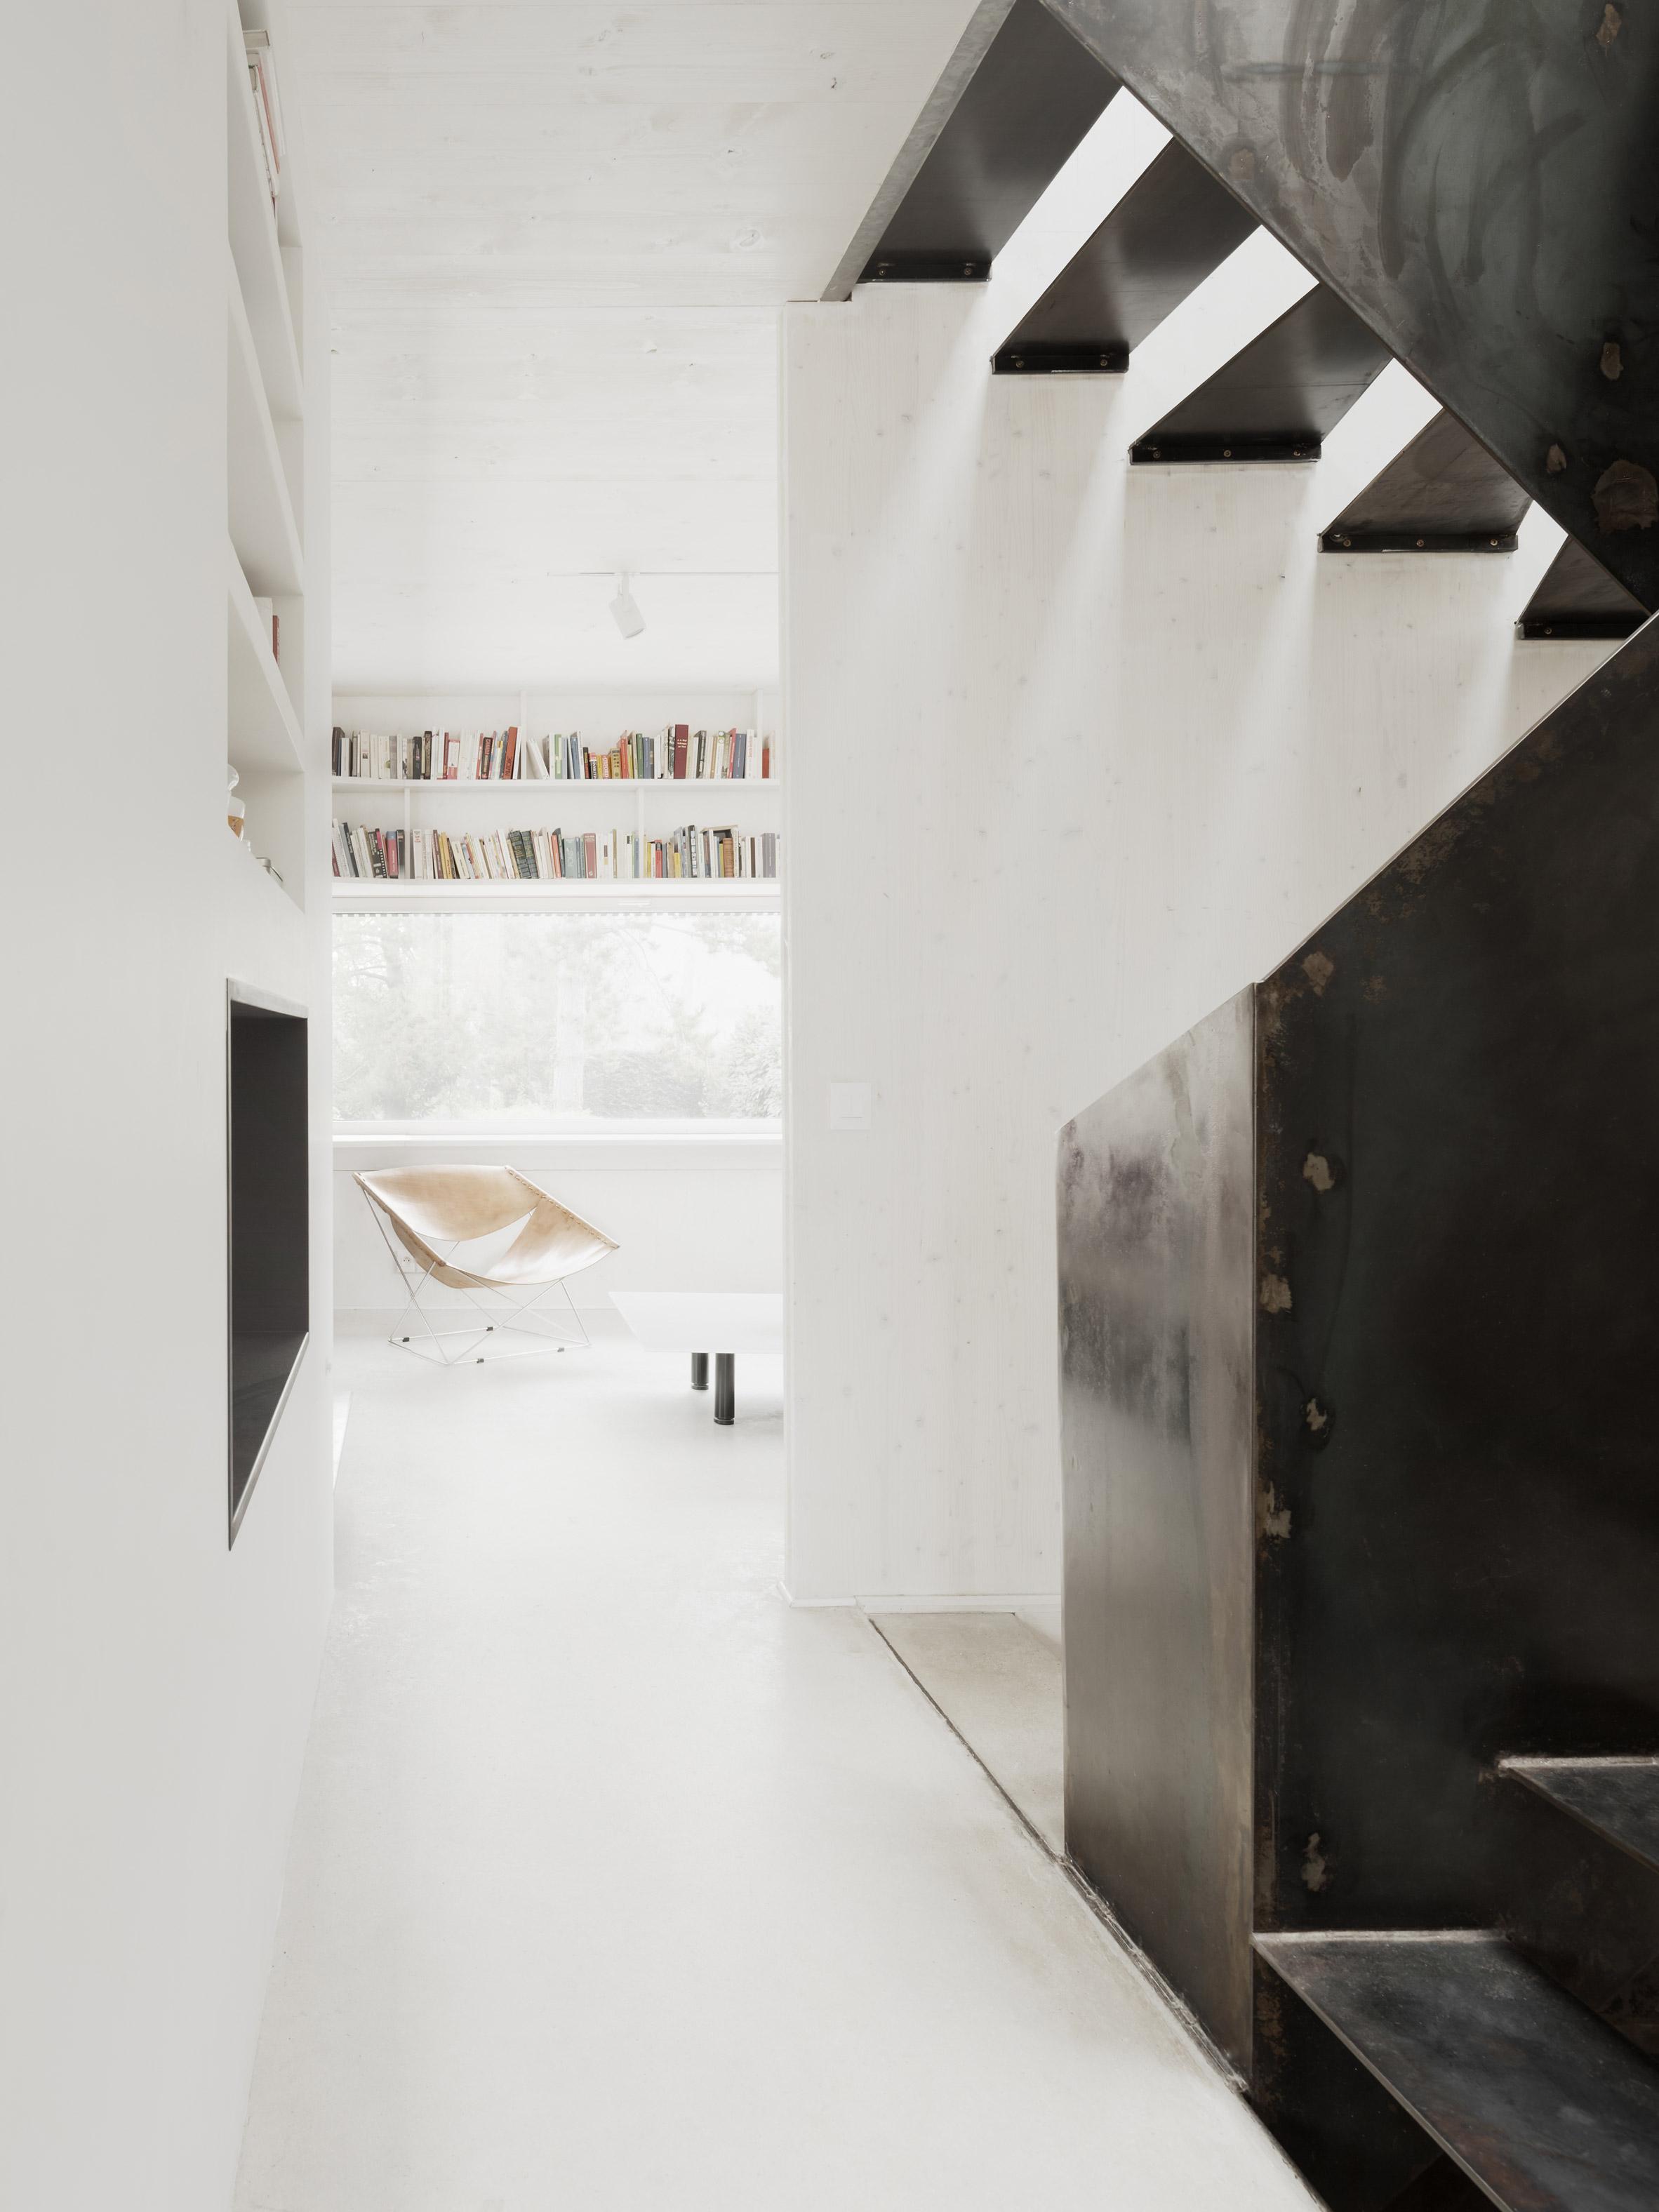 Marly House by Karawitz architects